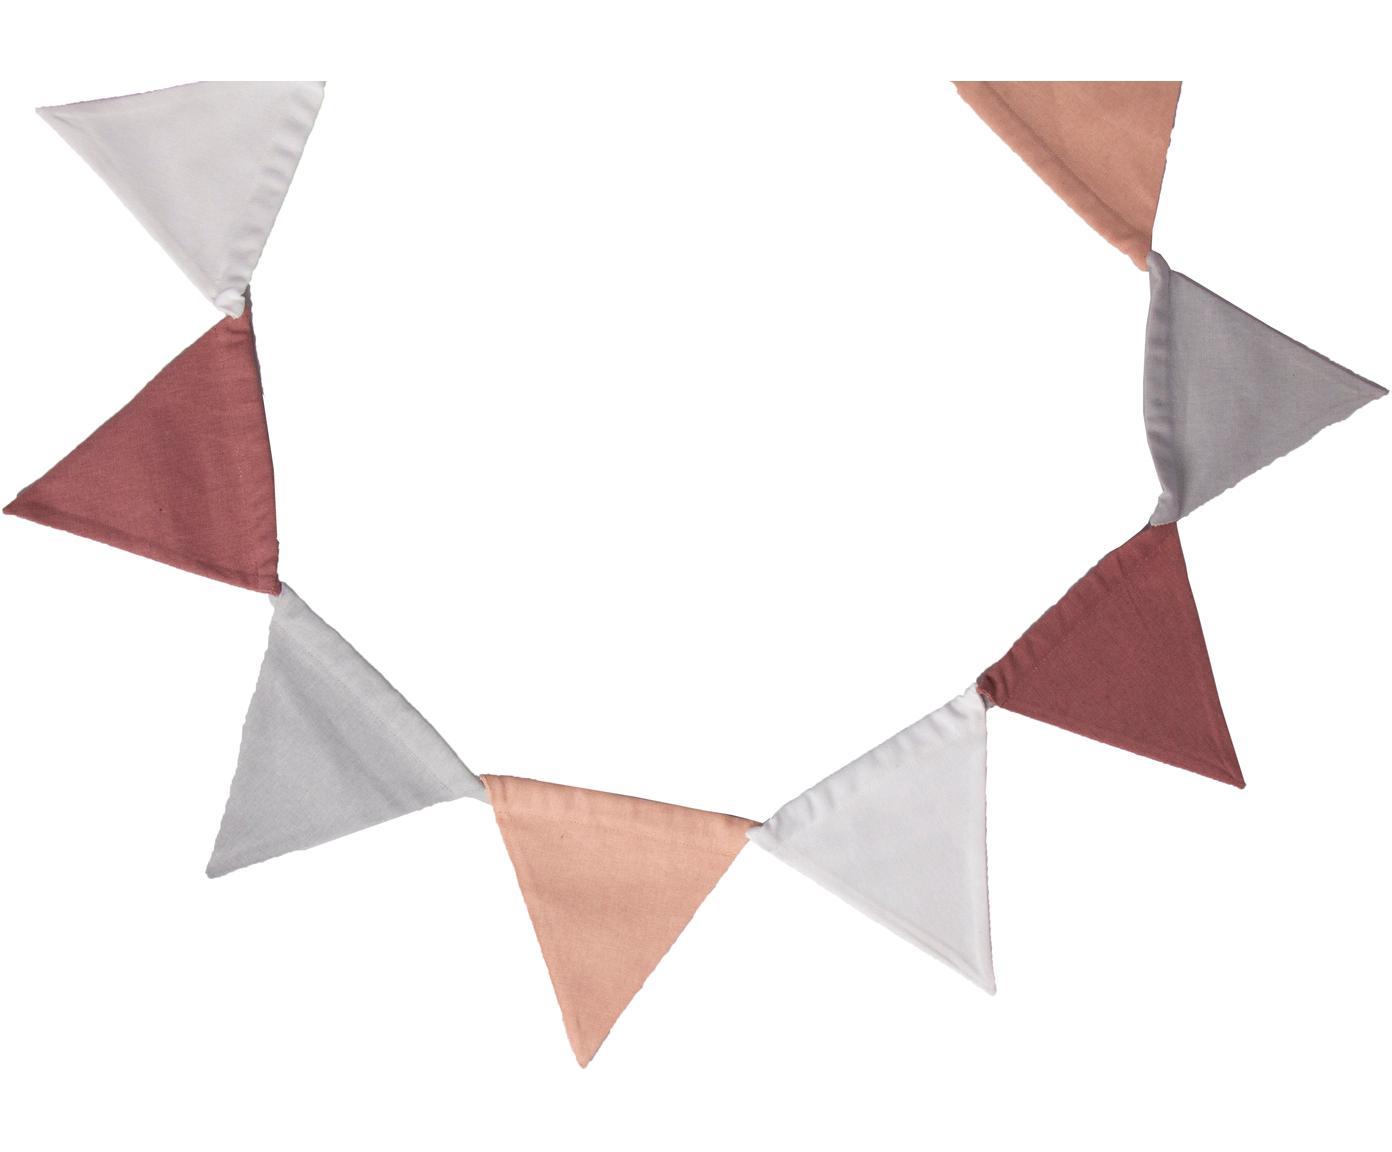 Ghirlanda Vimply, Cotone, Rosa, grigio, bianco, rosso scuro, Lung. 250 cm